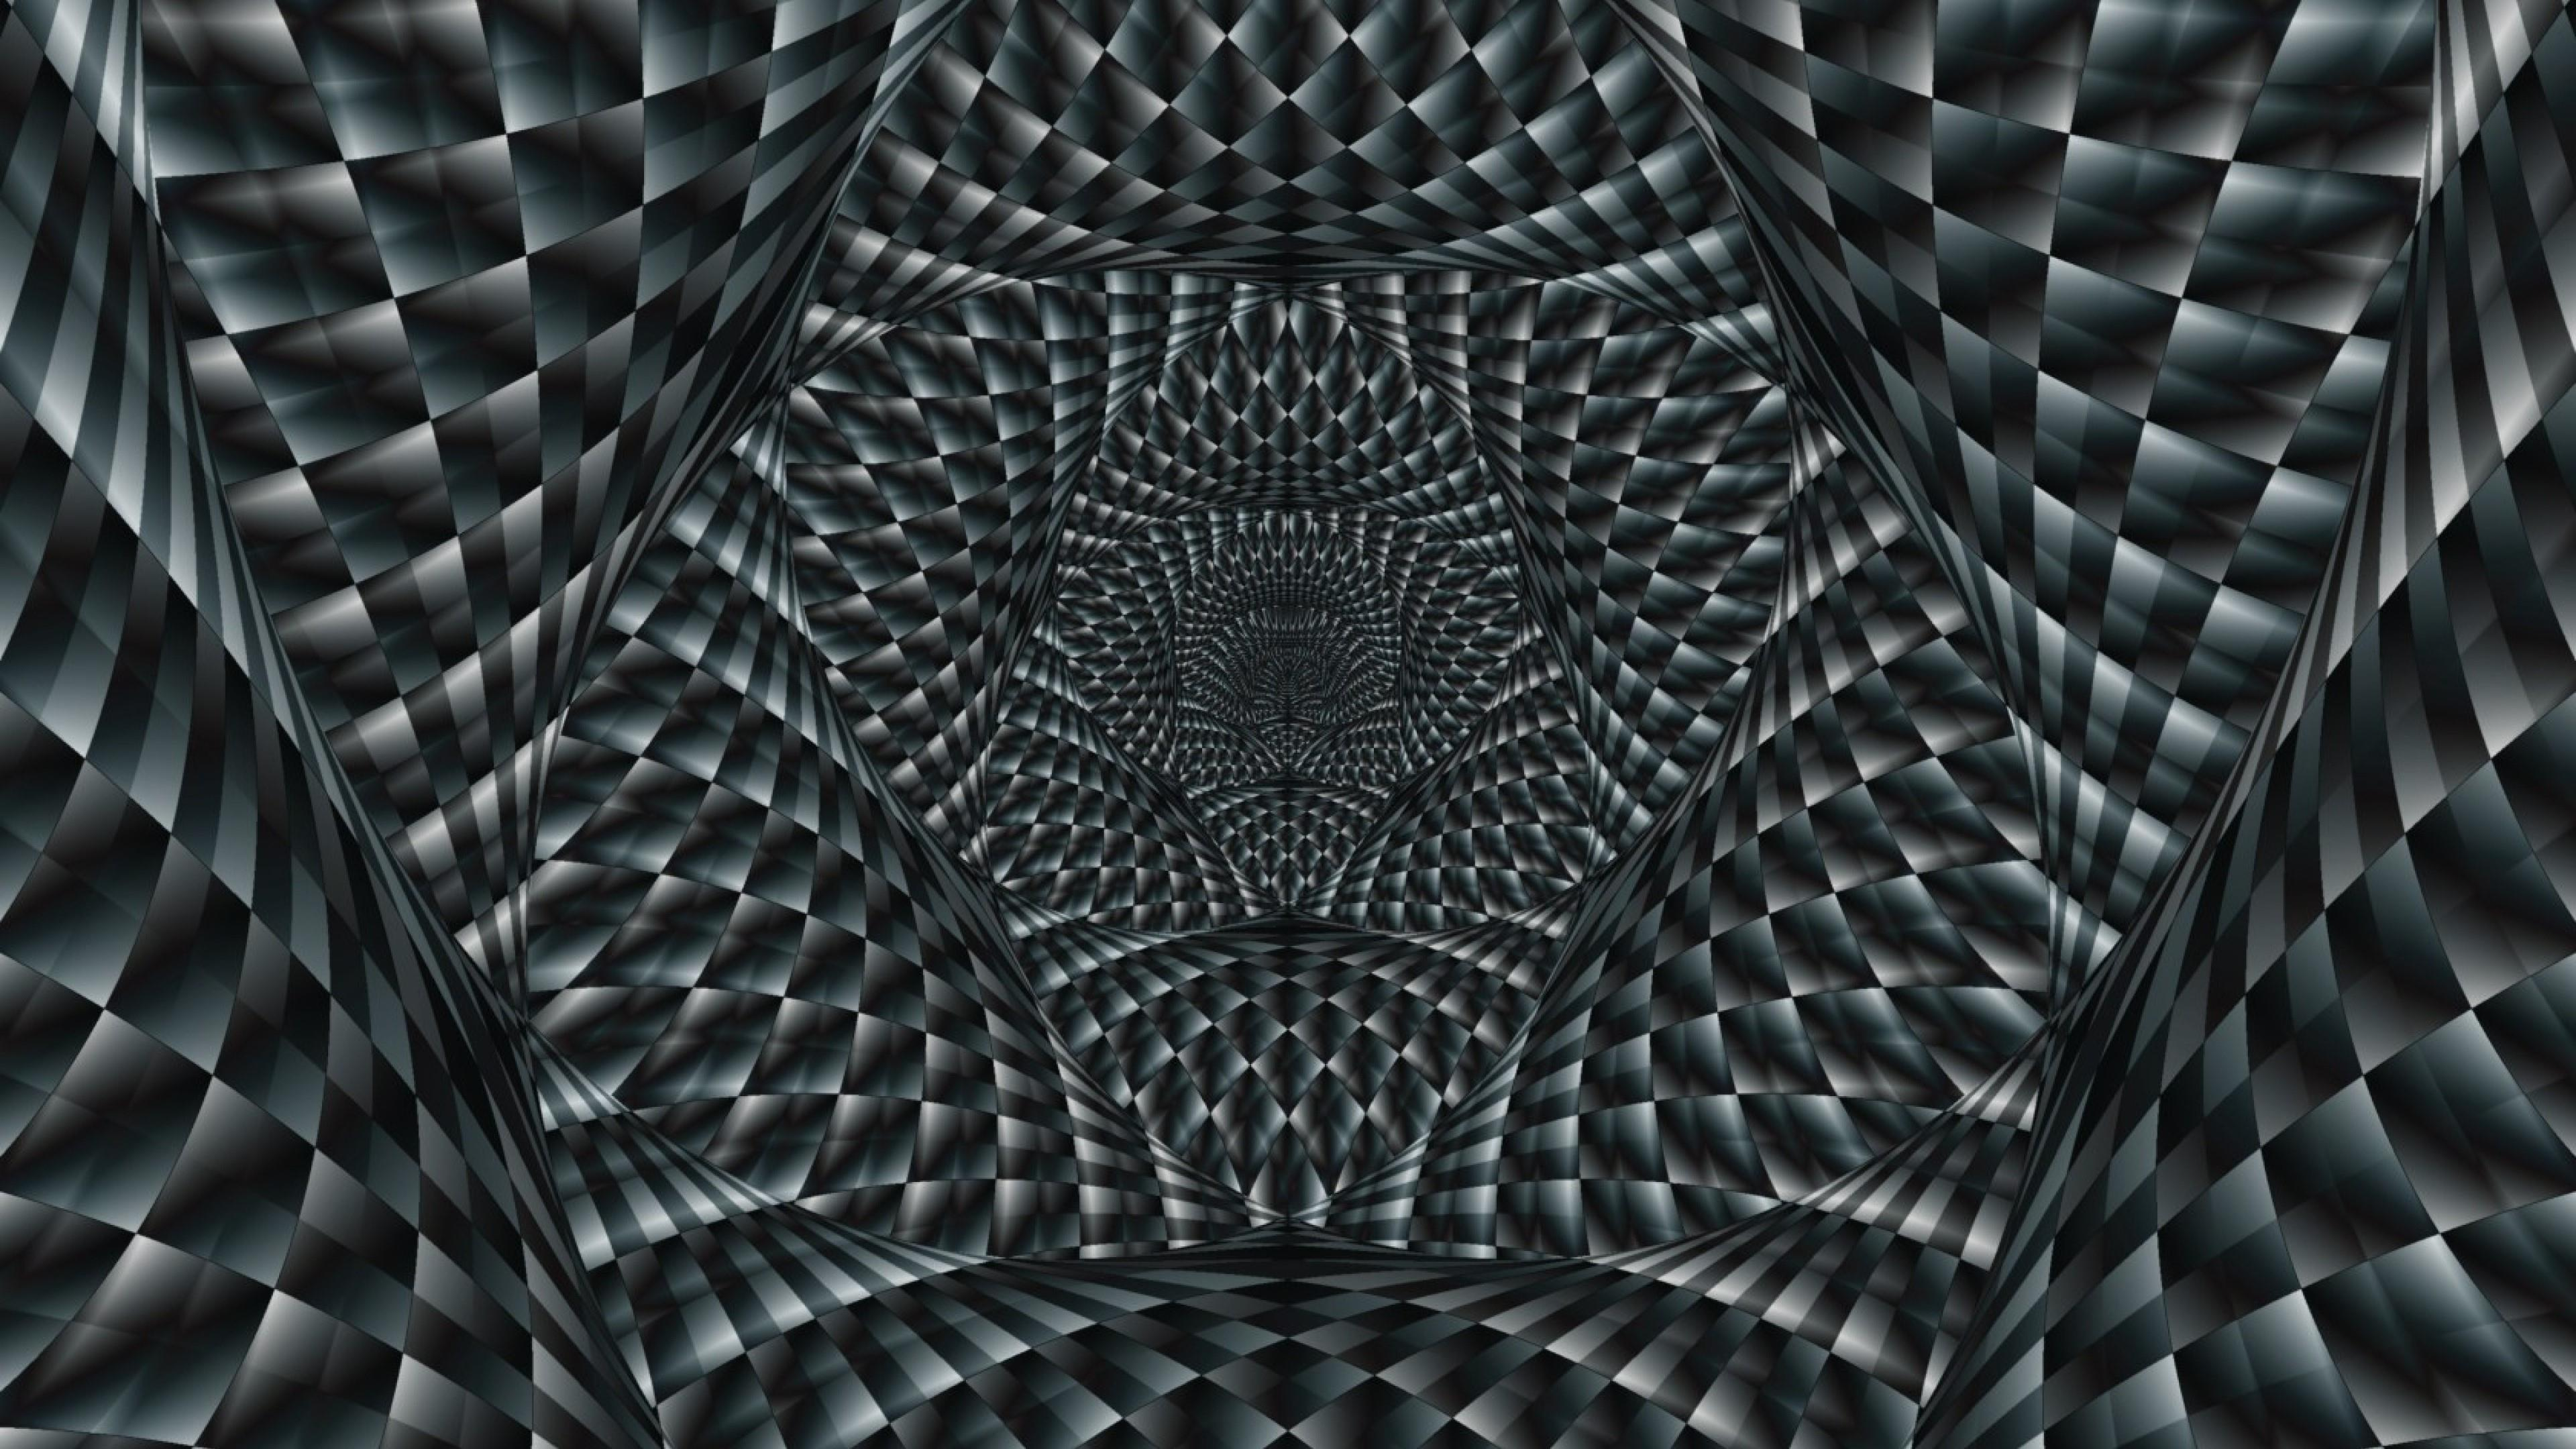 Optical illusion 4k wallpapers top free optical illusion 4k backgrounds wallpaperaccess - Optical illusion wallpaper hd ...